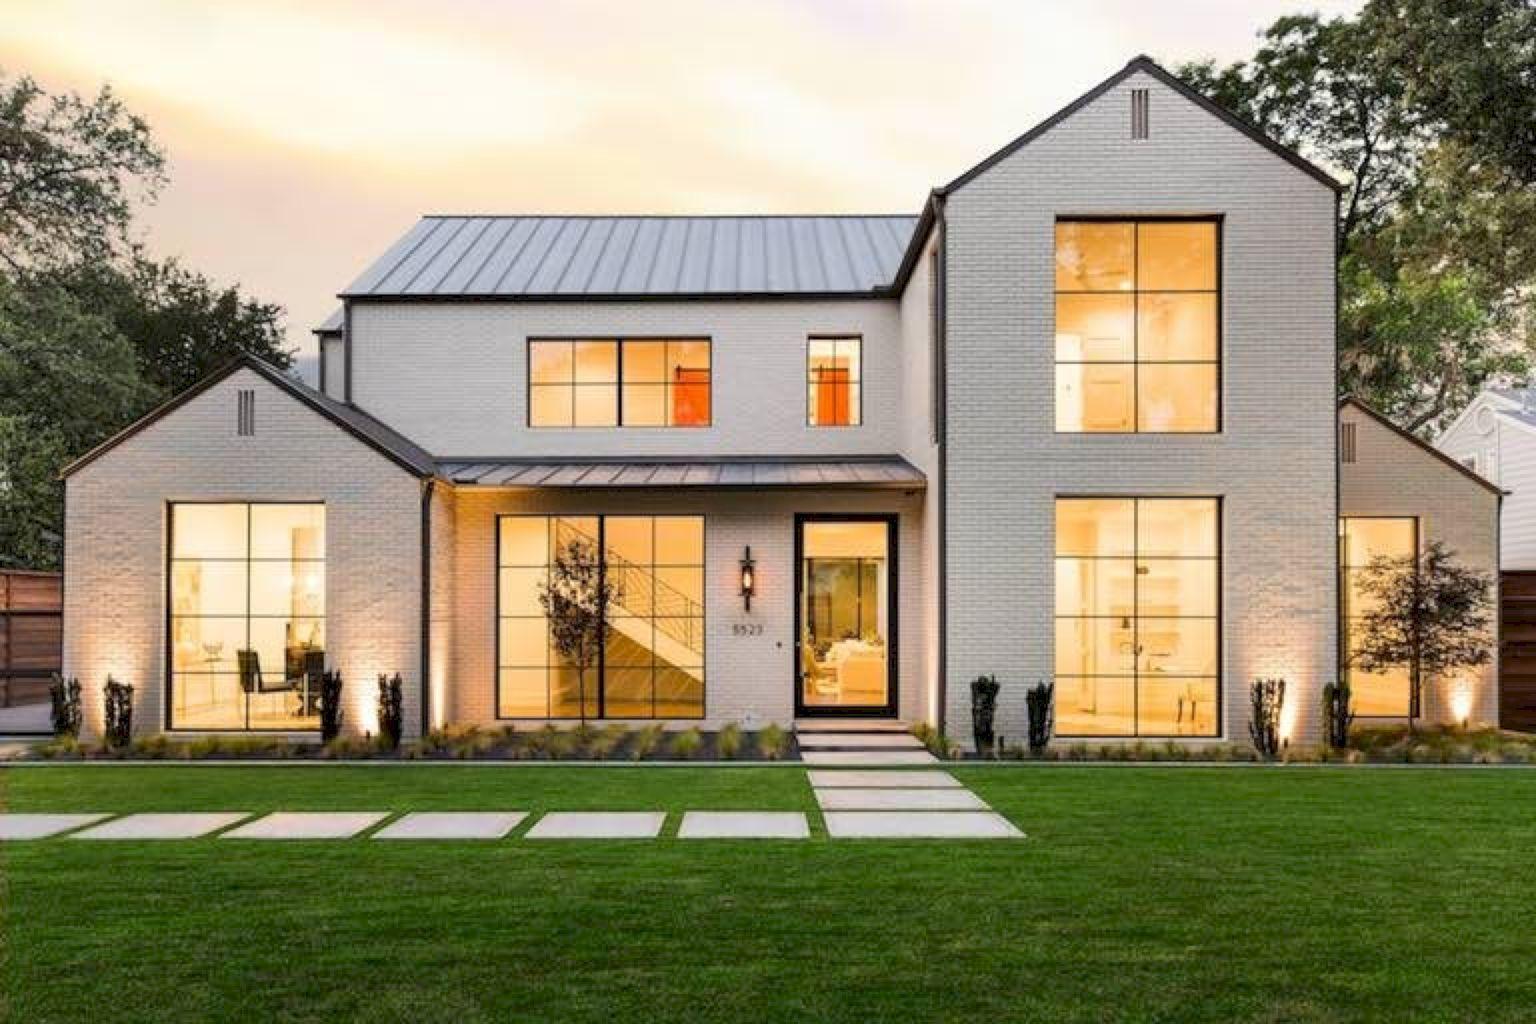 60 Stunning Modern Farmhouse Exterior Design Ideas